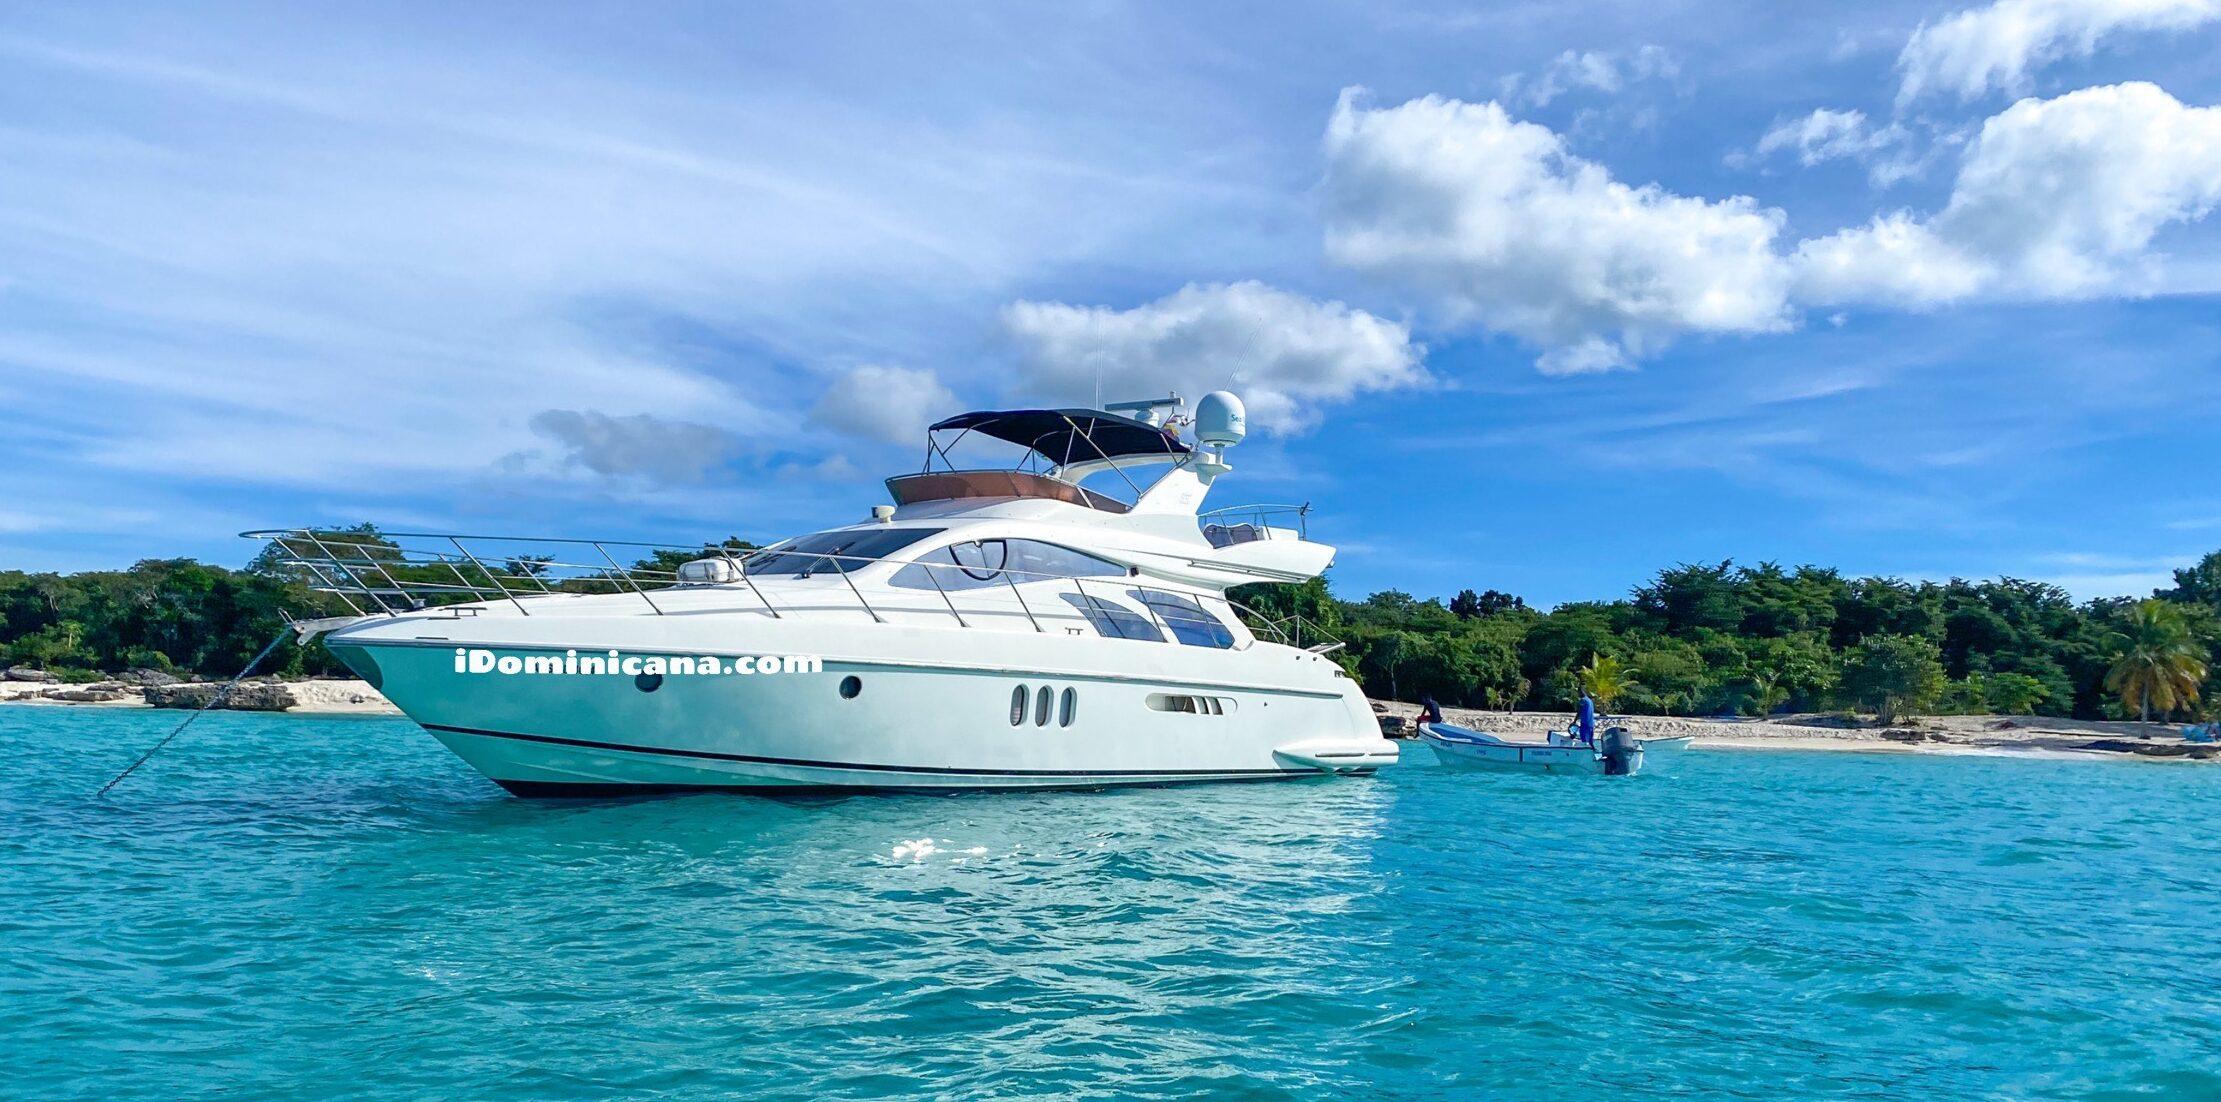 Аренда яхты (Доминикана): Sea Ray 39 футов - о.Саона, о.Каталина